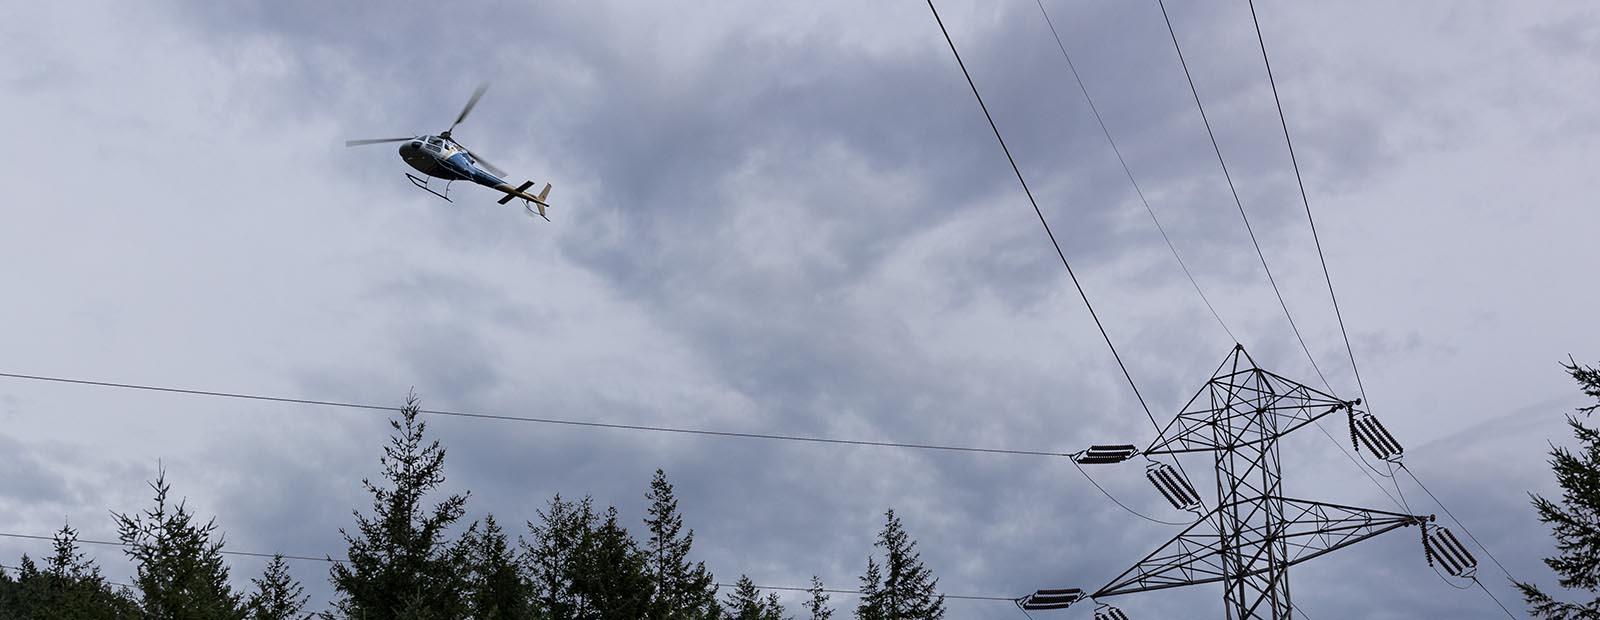 Helicopters – Radar Altimeters